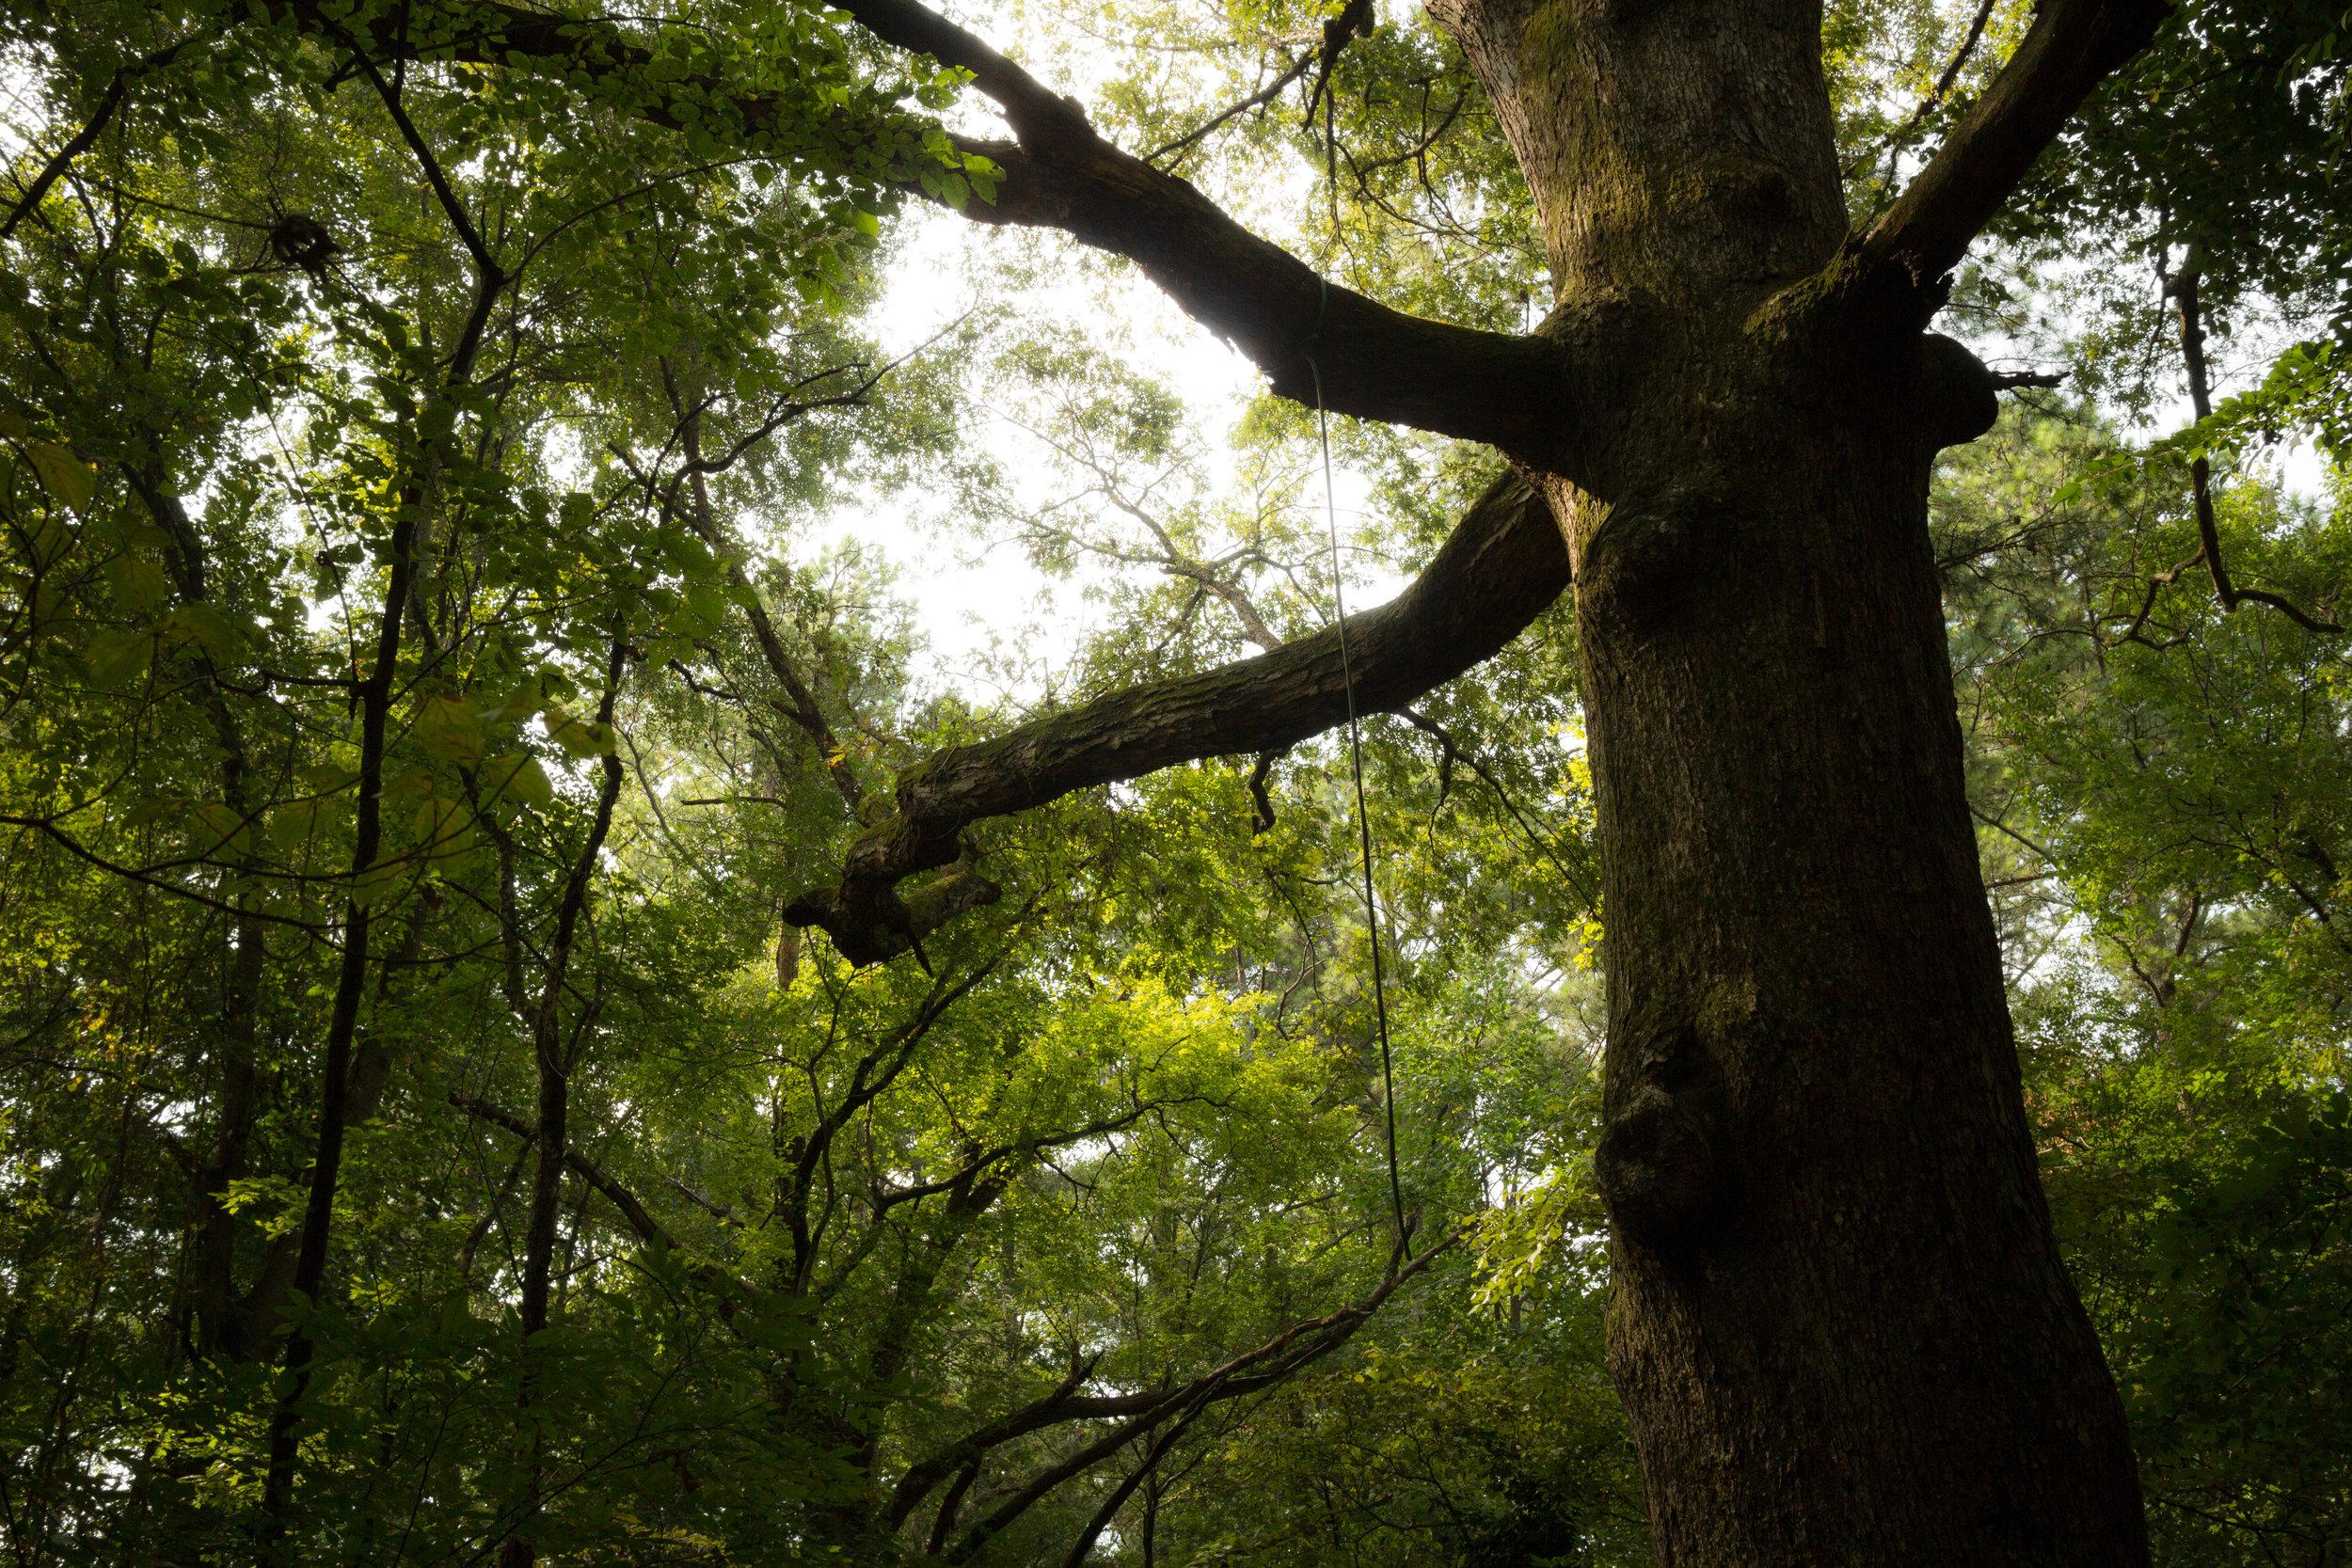 connally-nature-park_15022997692_o.jpg